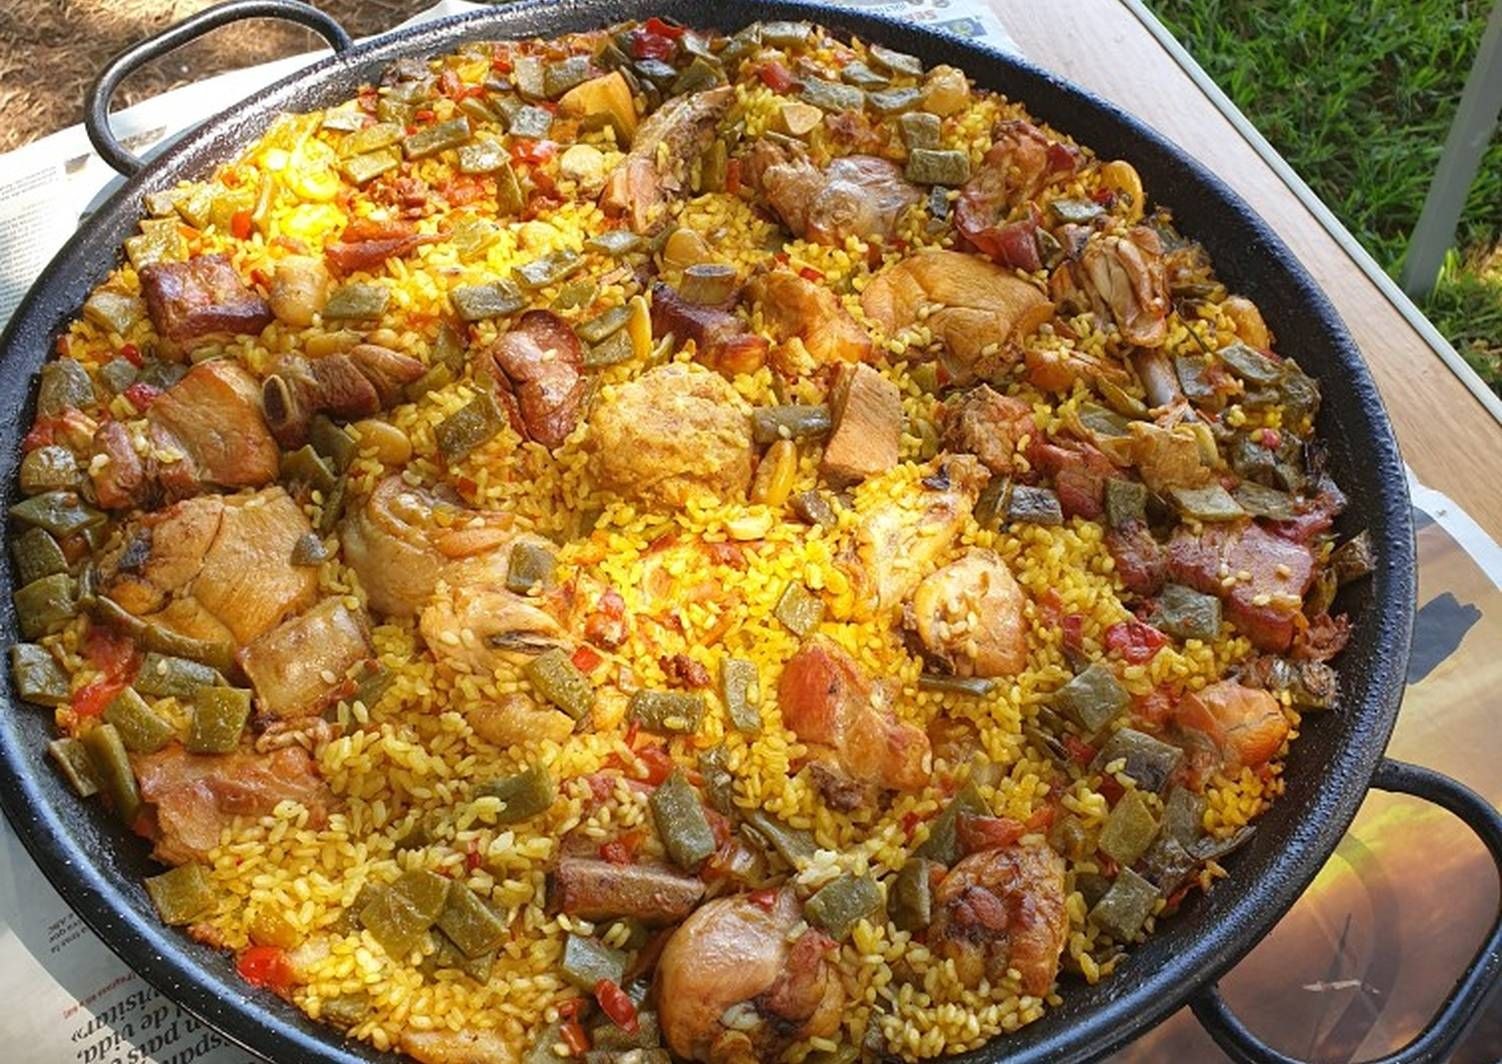 f85b2d7b2a1944c3db87e6386ac9bf57 - Paella Valenciana Recetas